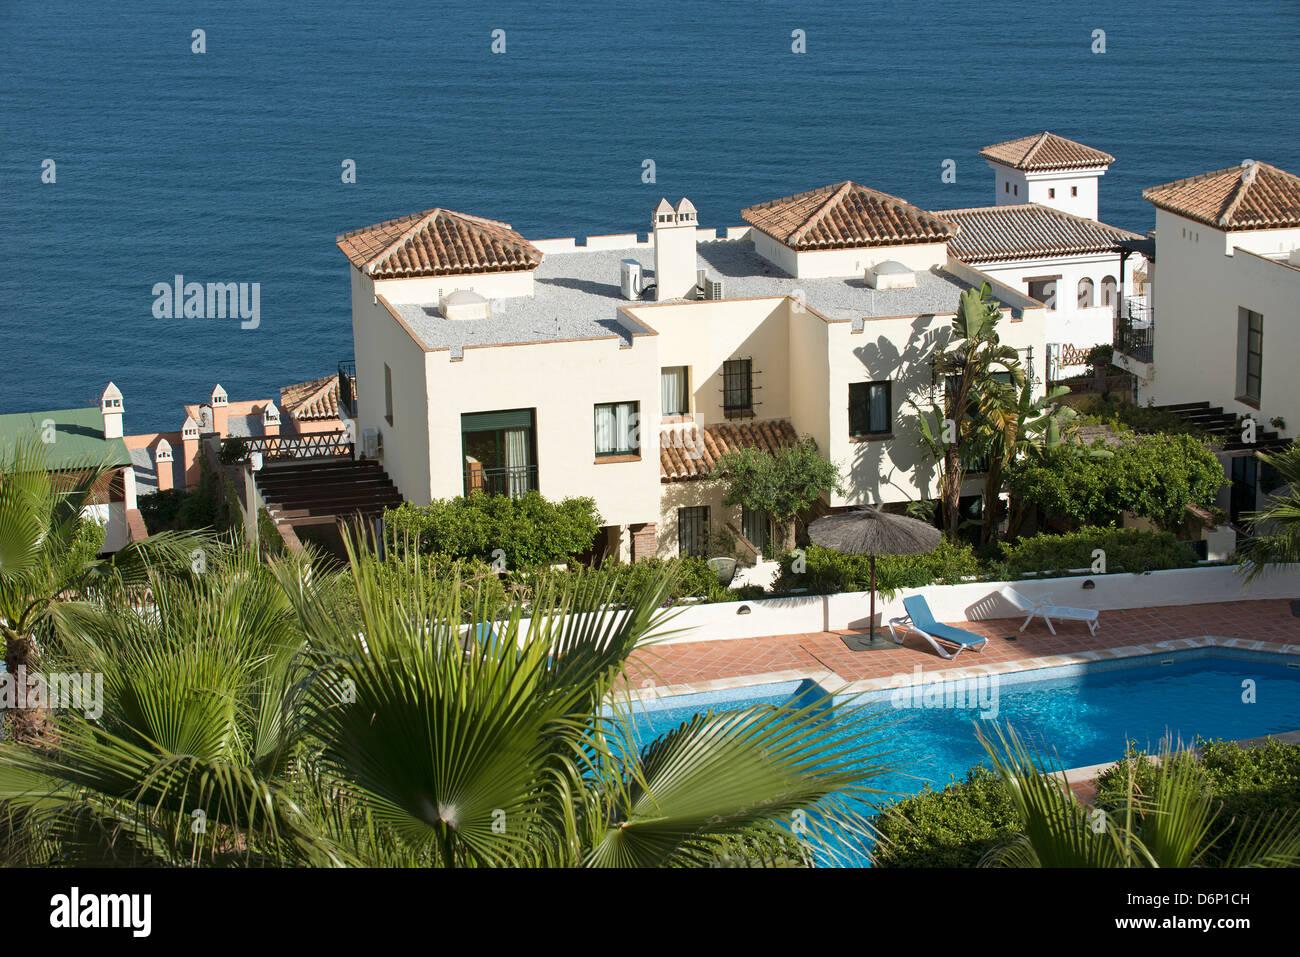 spanish villas overlook the mediterranean sea at la herradura stock